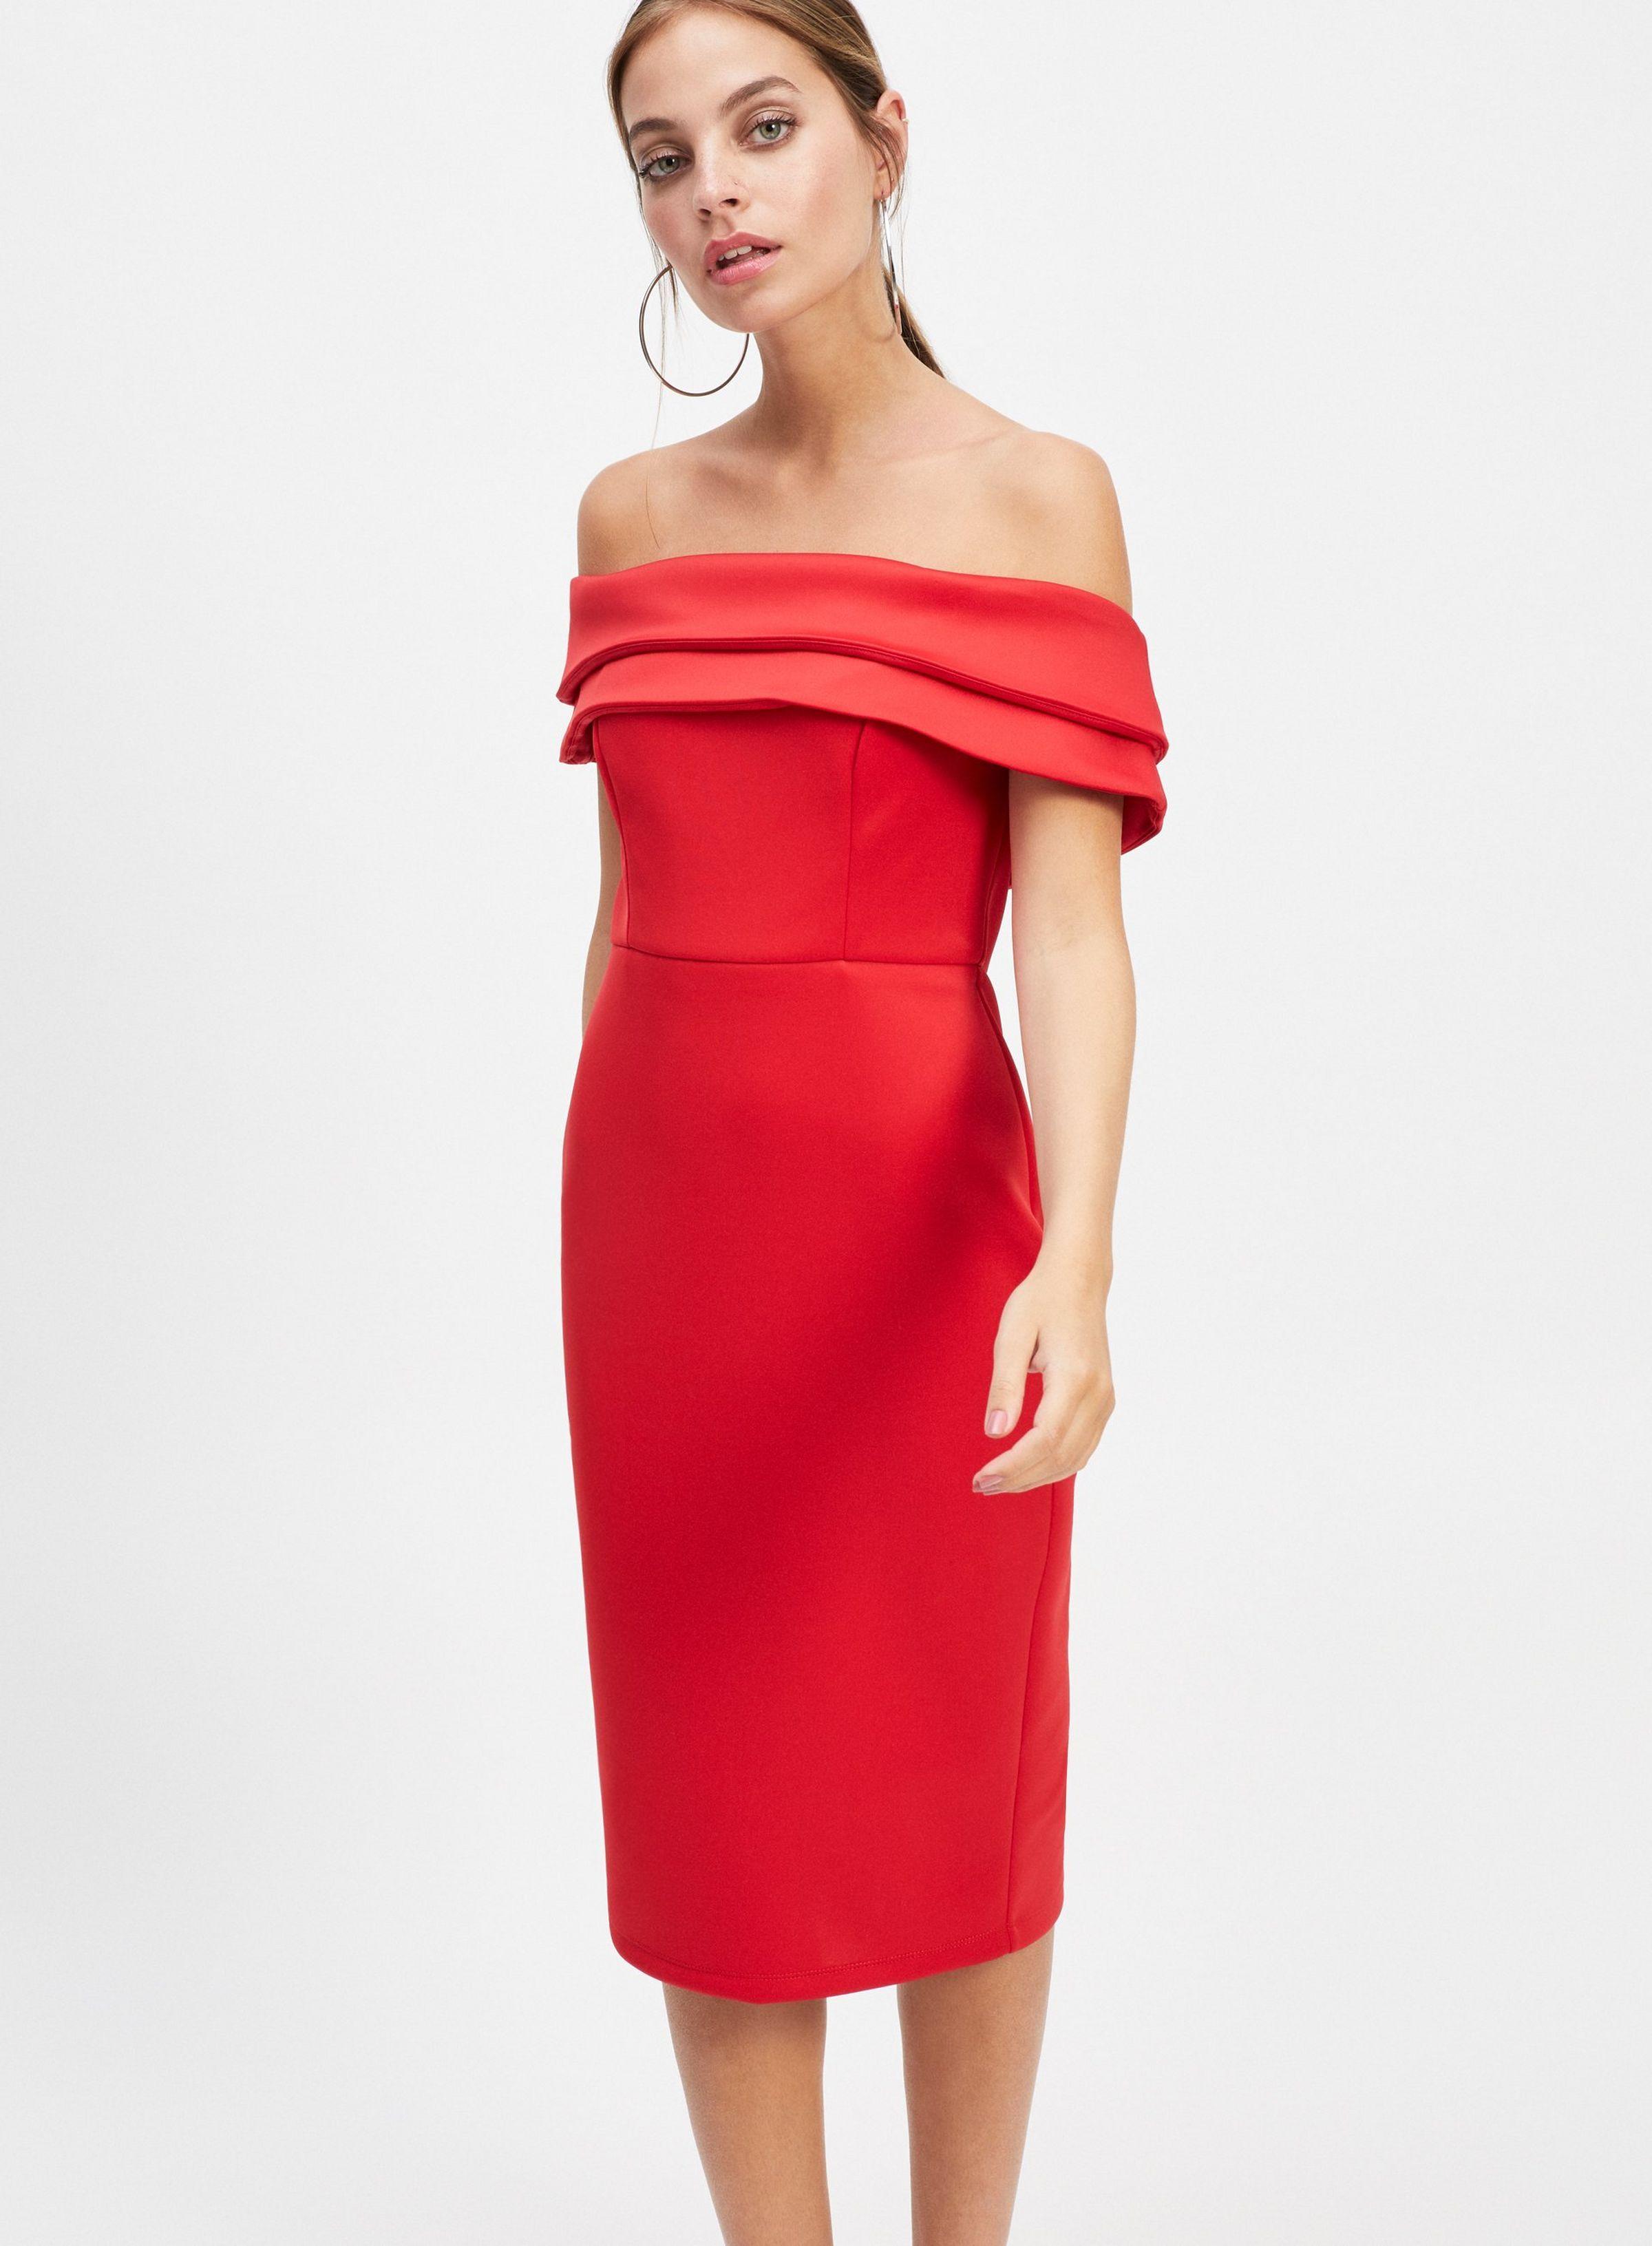 dfd7437b2c 23 prom dresses - the best prom dresses UK